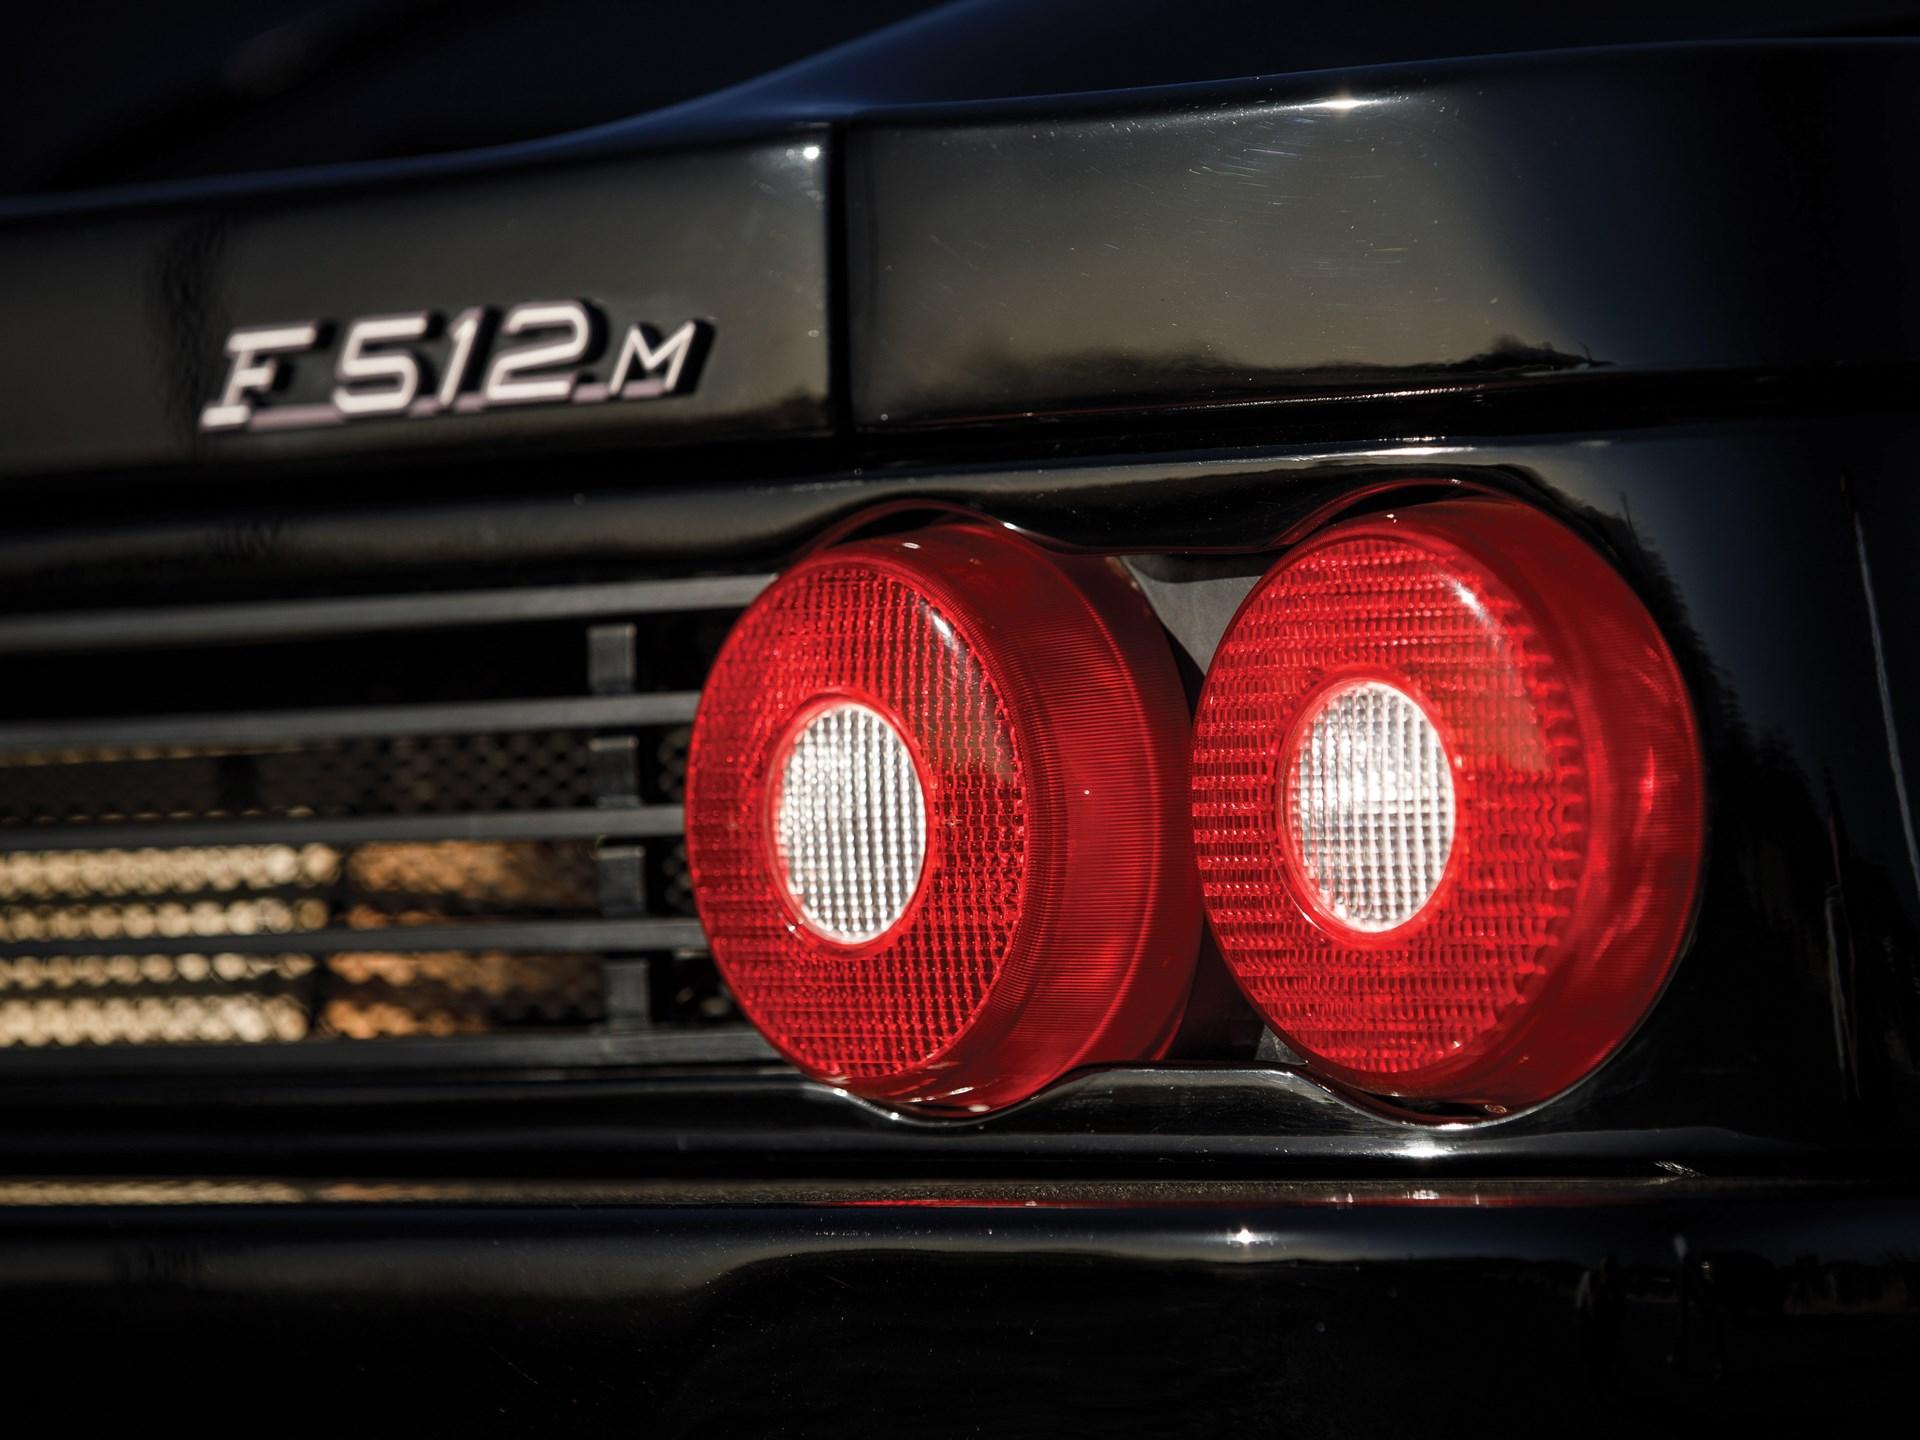 1995 Ferrari F512 M